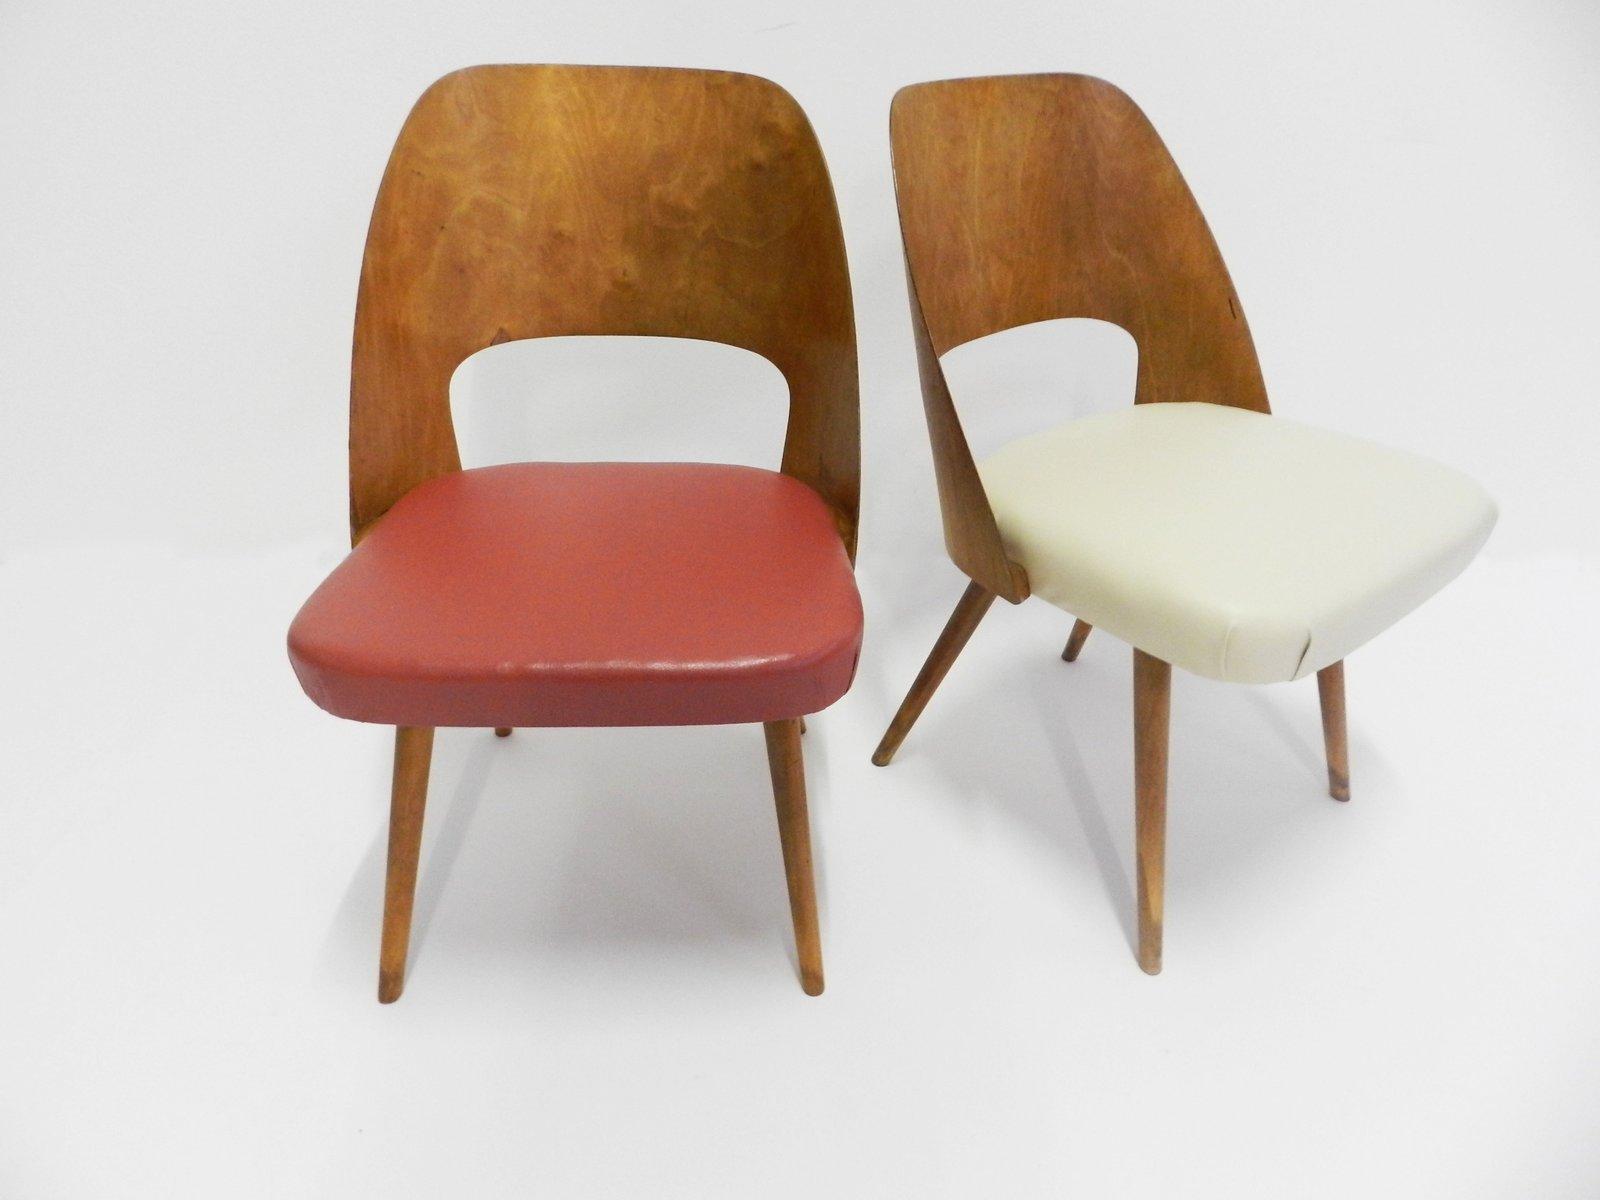 chaises d appoint rouges et blanches danemark 1950s